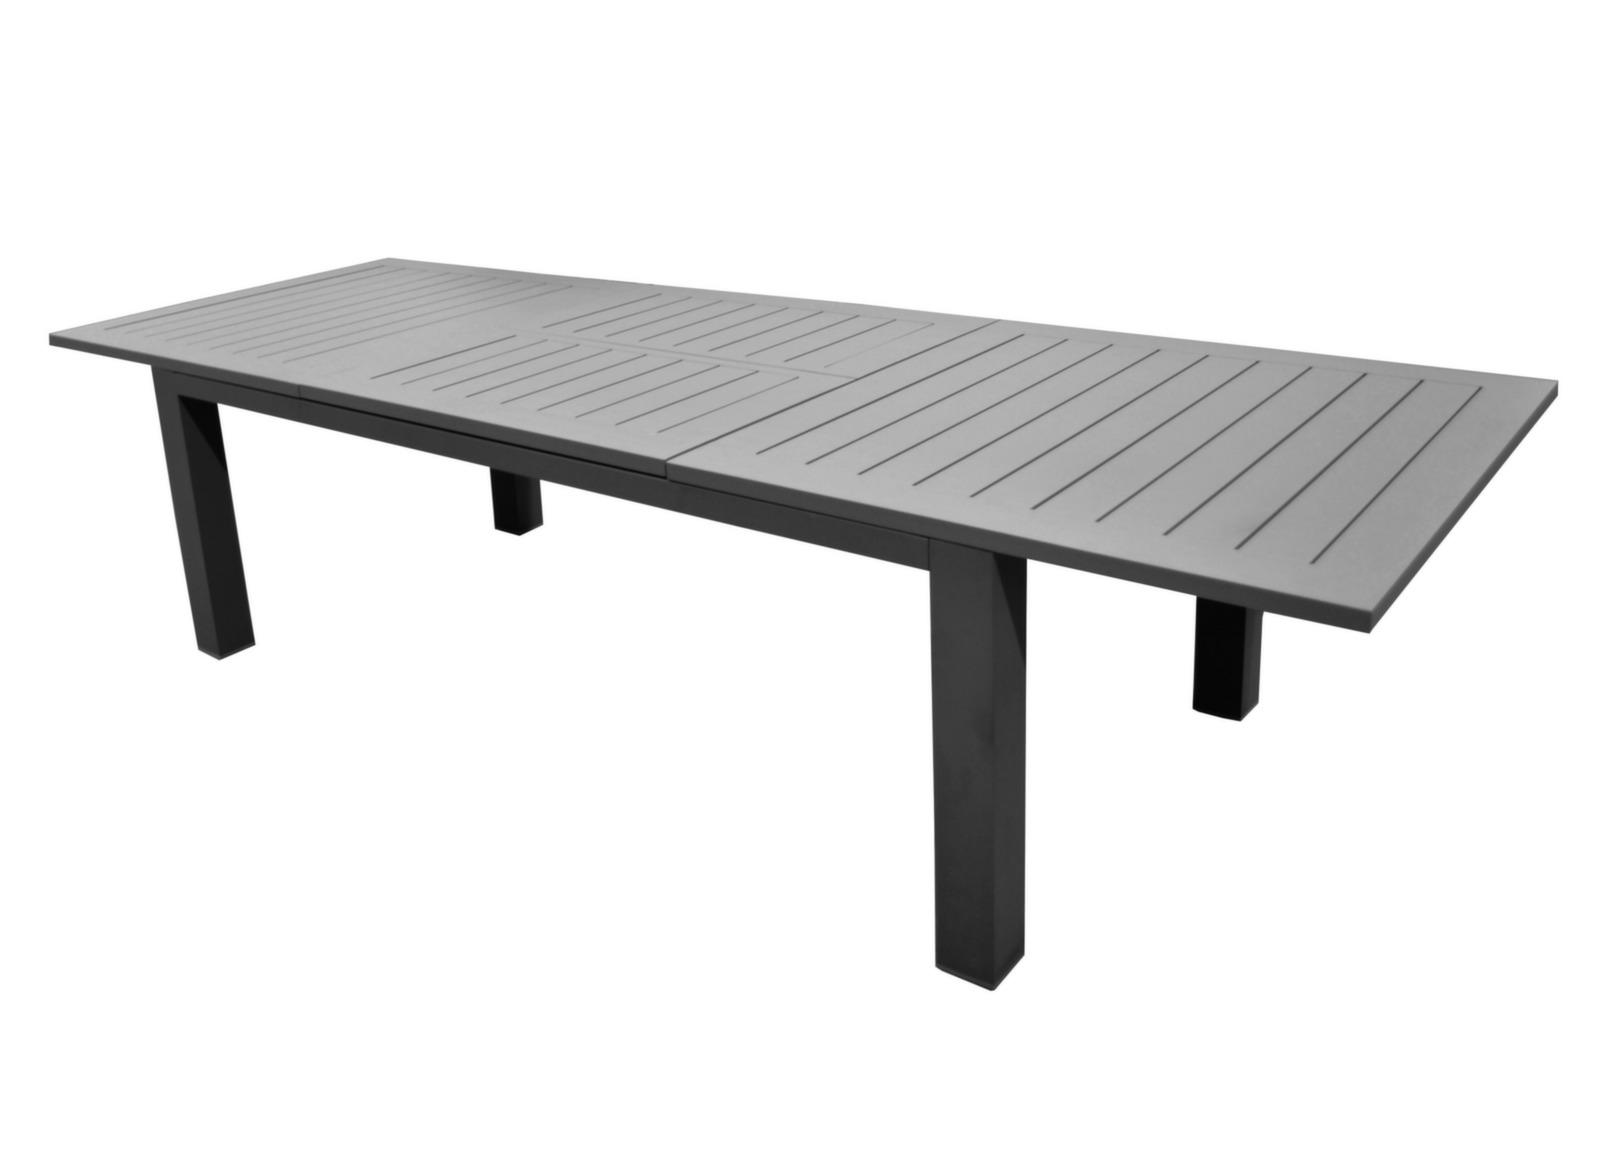 Table De Jardin Aluminium 12 Places Aurore Gamme Oco